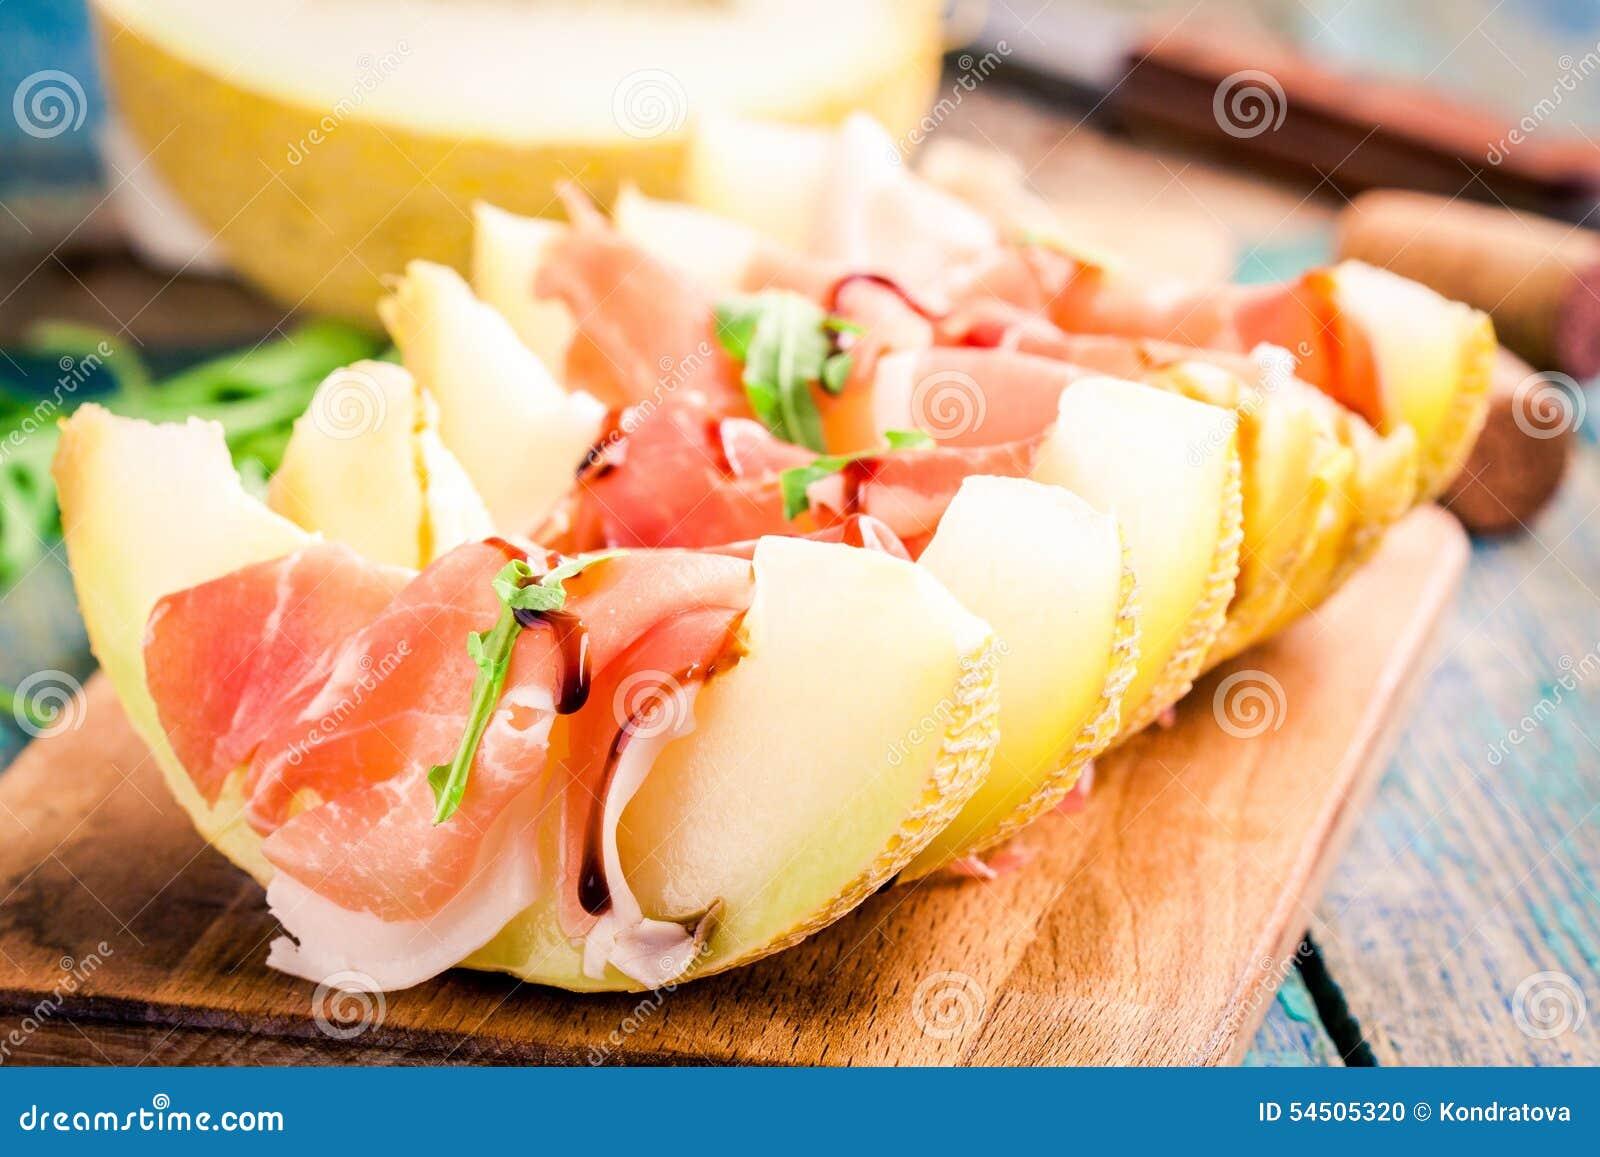 Melon avec les tranches minces de feuilles de prosciutto et d arugula